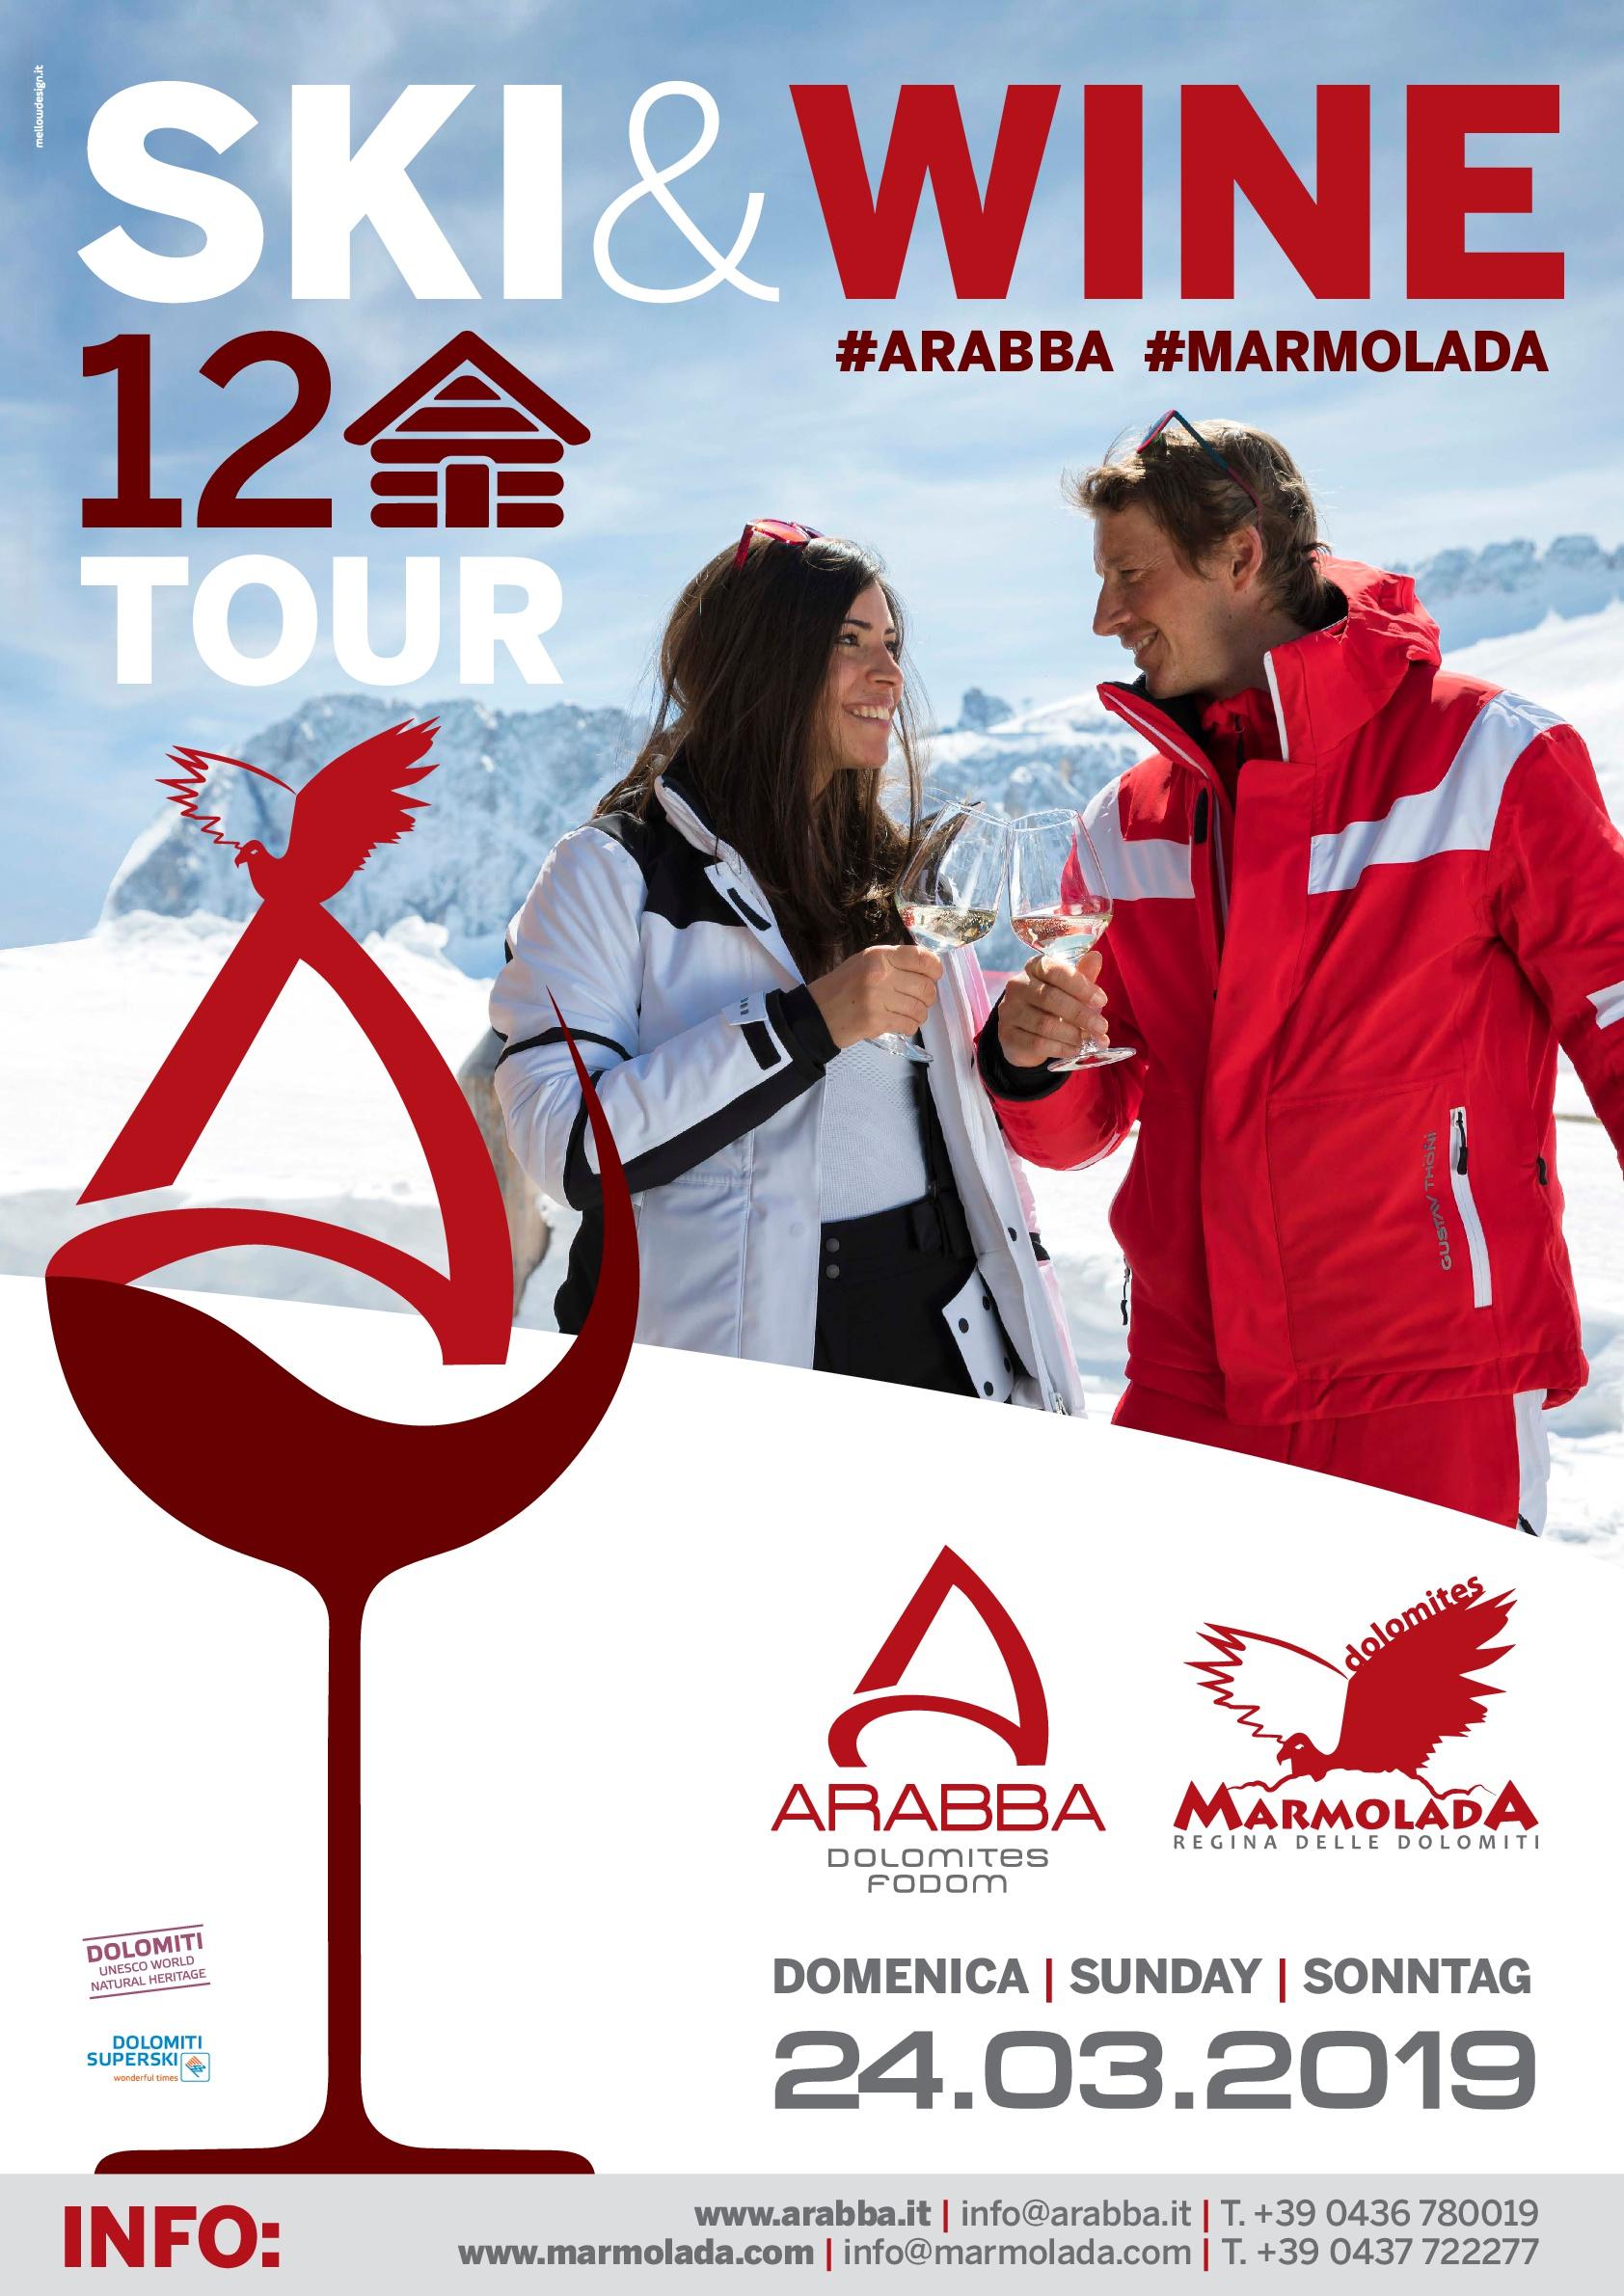 ski-and-wine-arabba-marmolada-2019